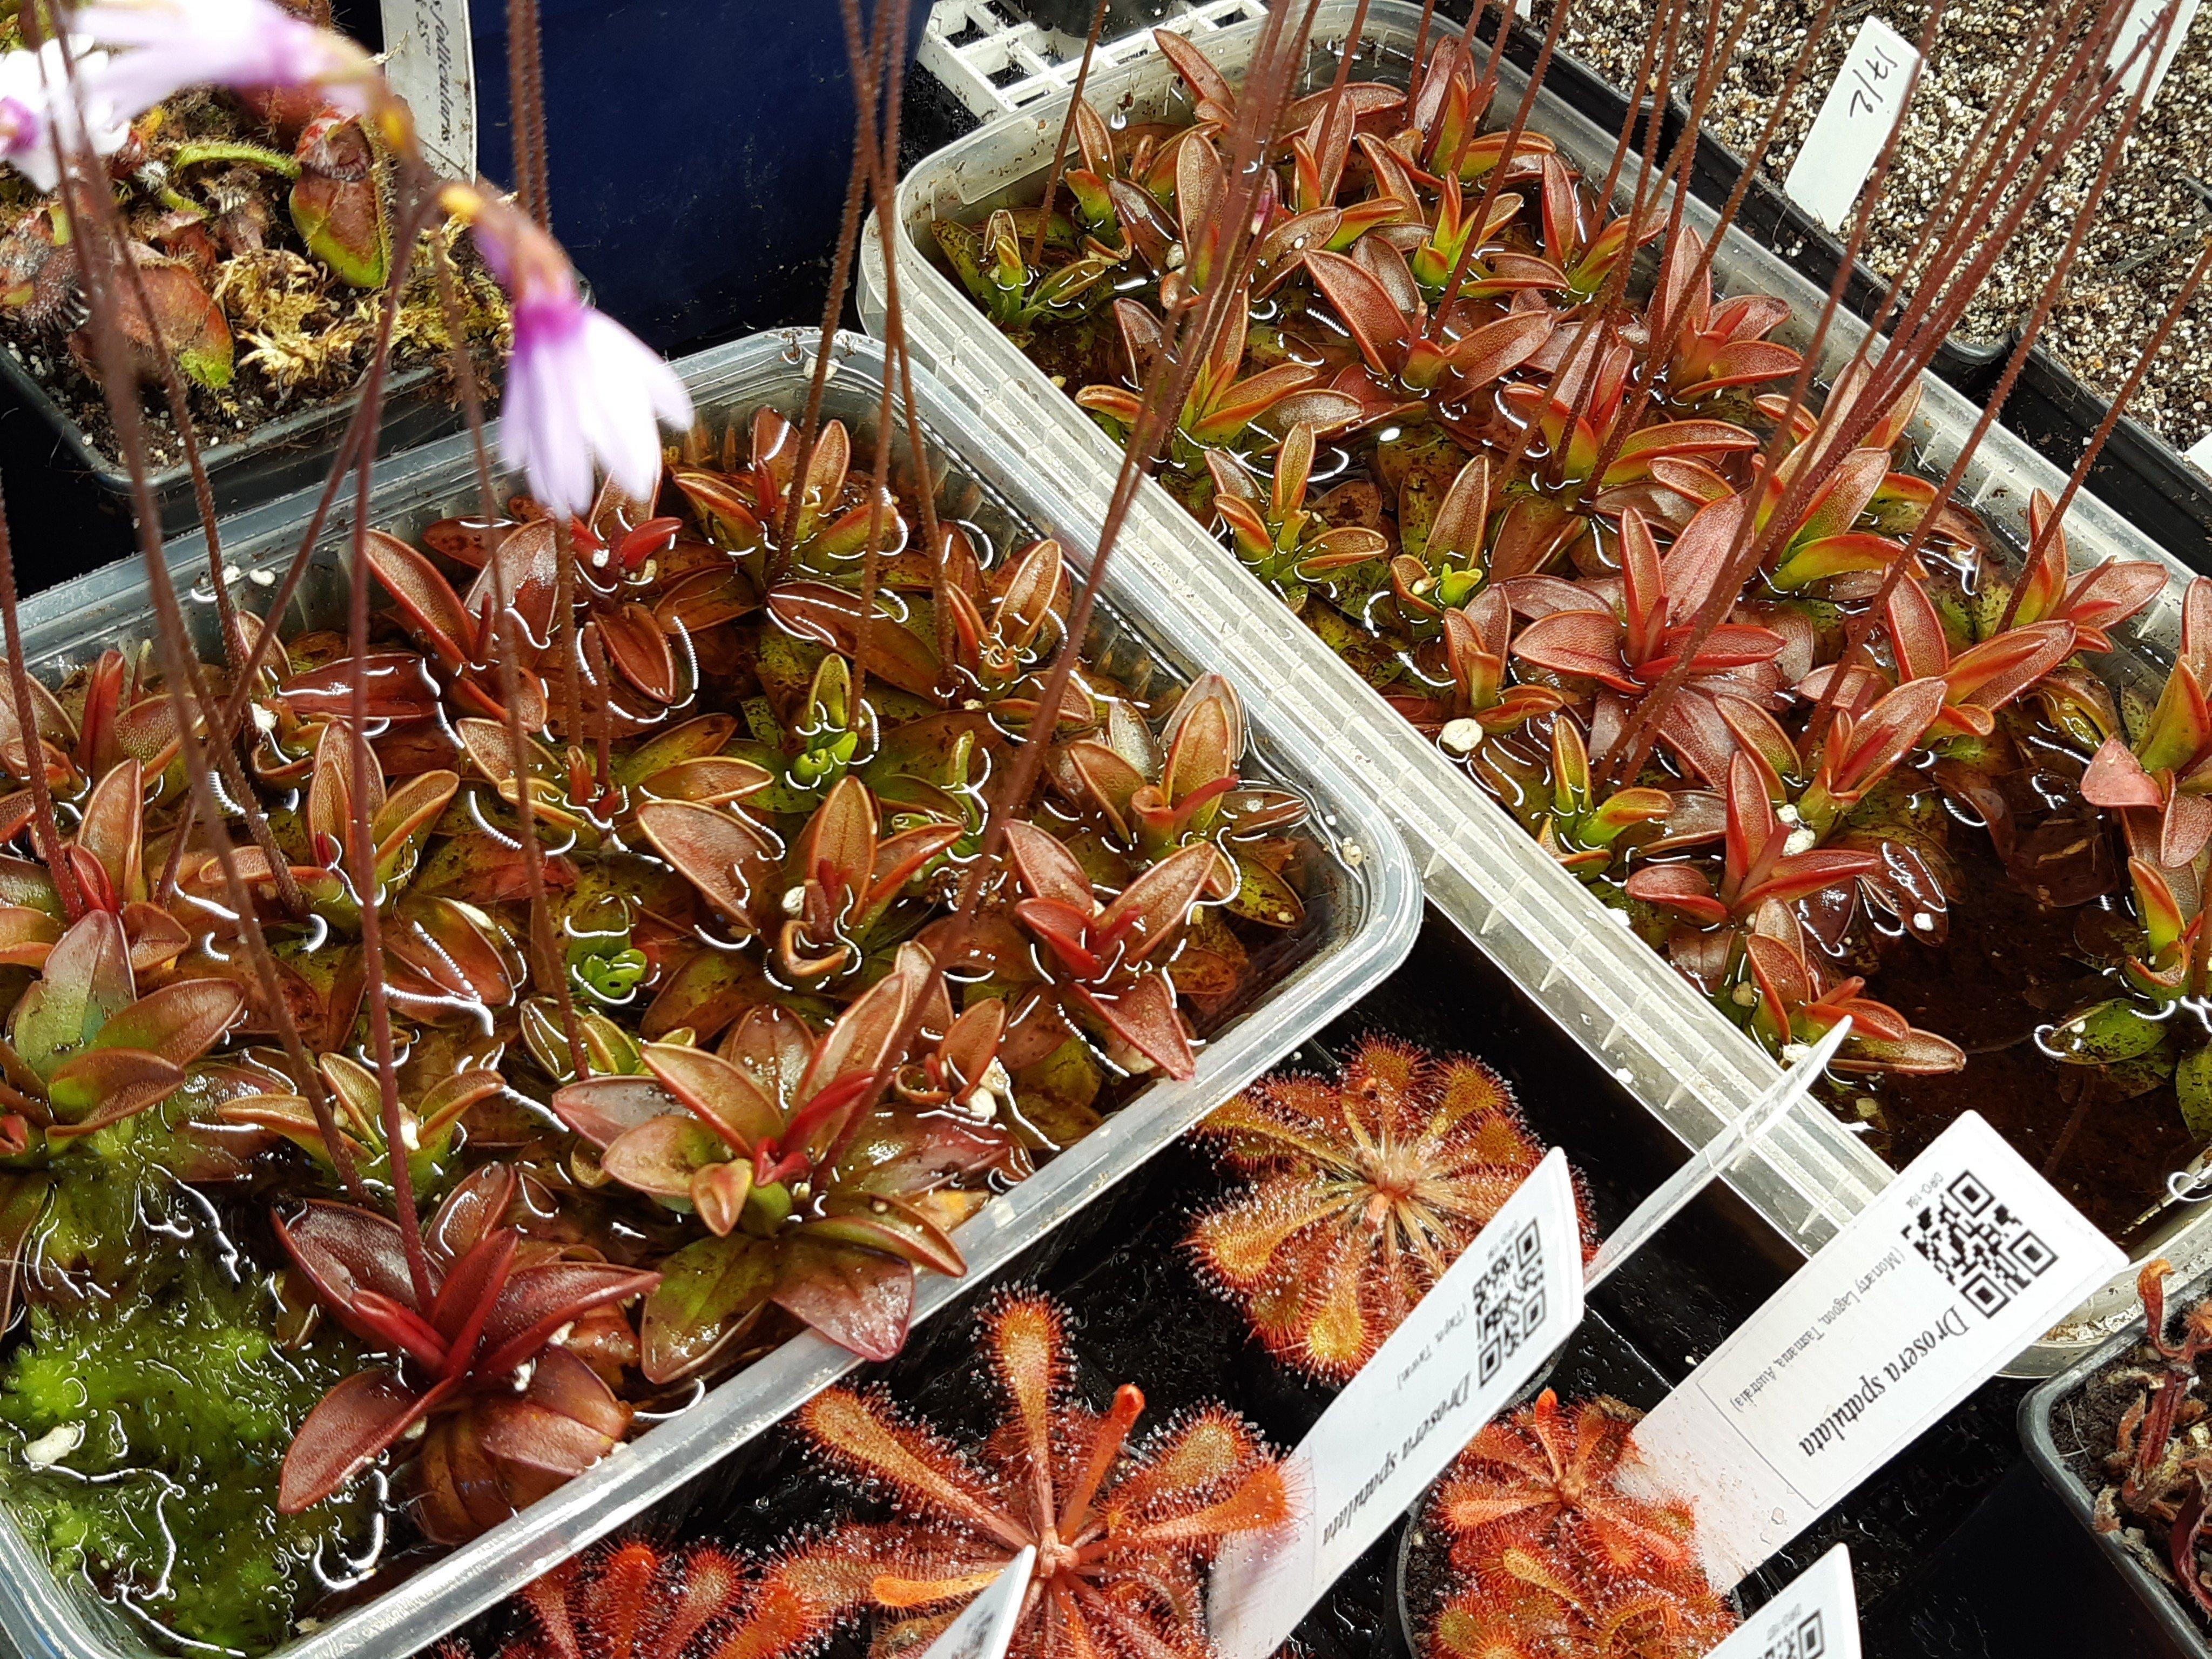 Pinguicula planifolia adultes à vendre Signal-attachment-2020-03-24-152140.jpeg.67c05dfd41c9329b7eb6c0d68a9b02eb